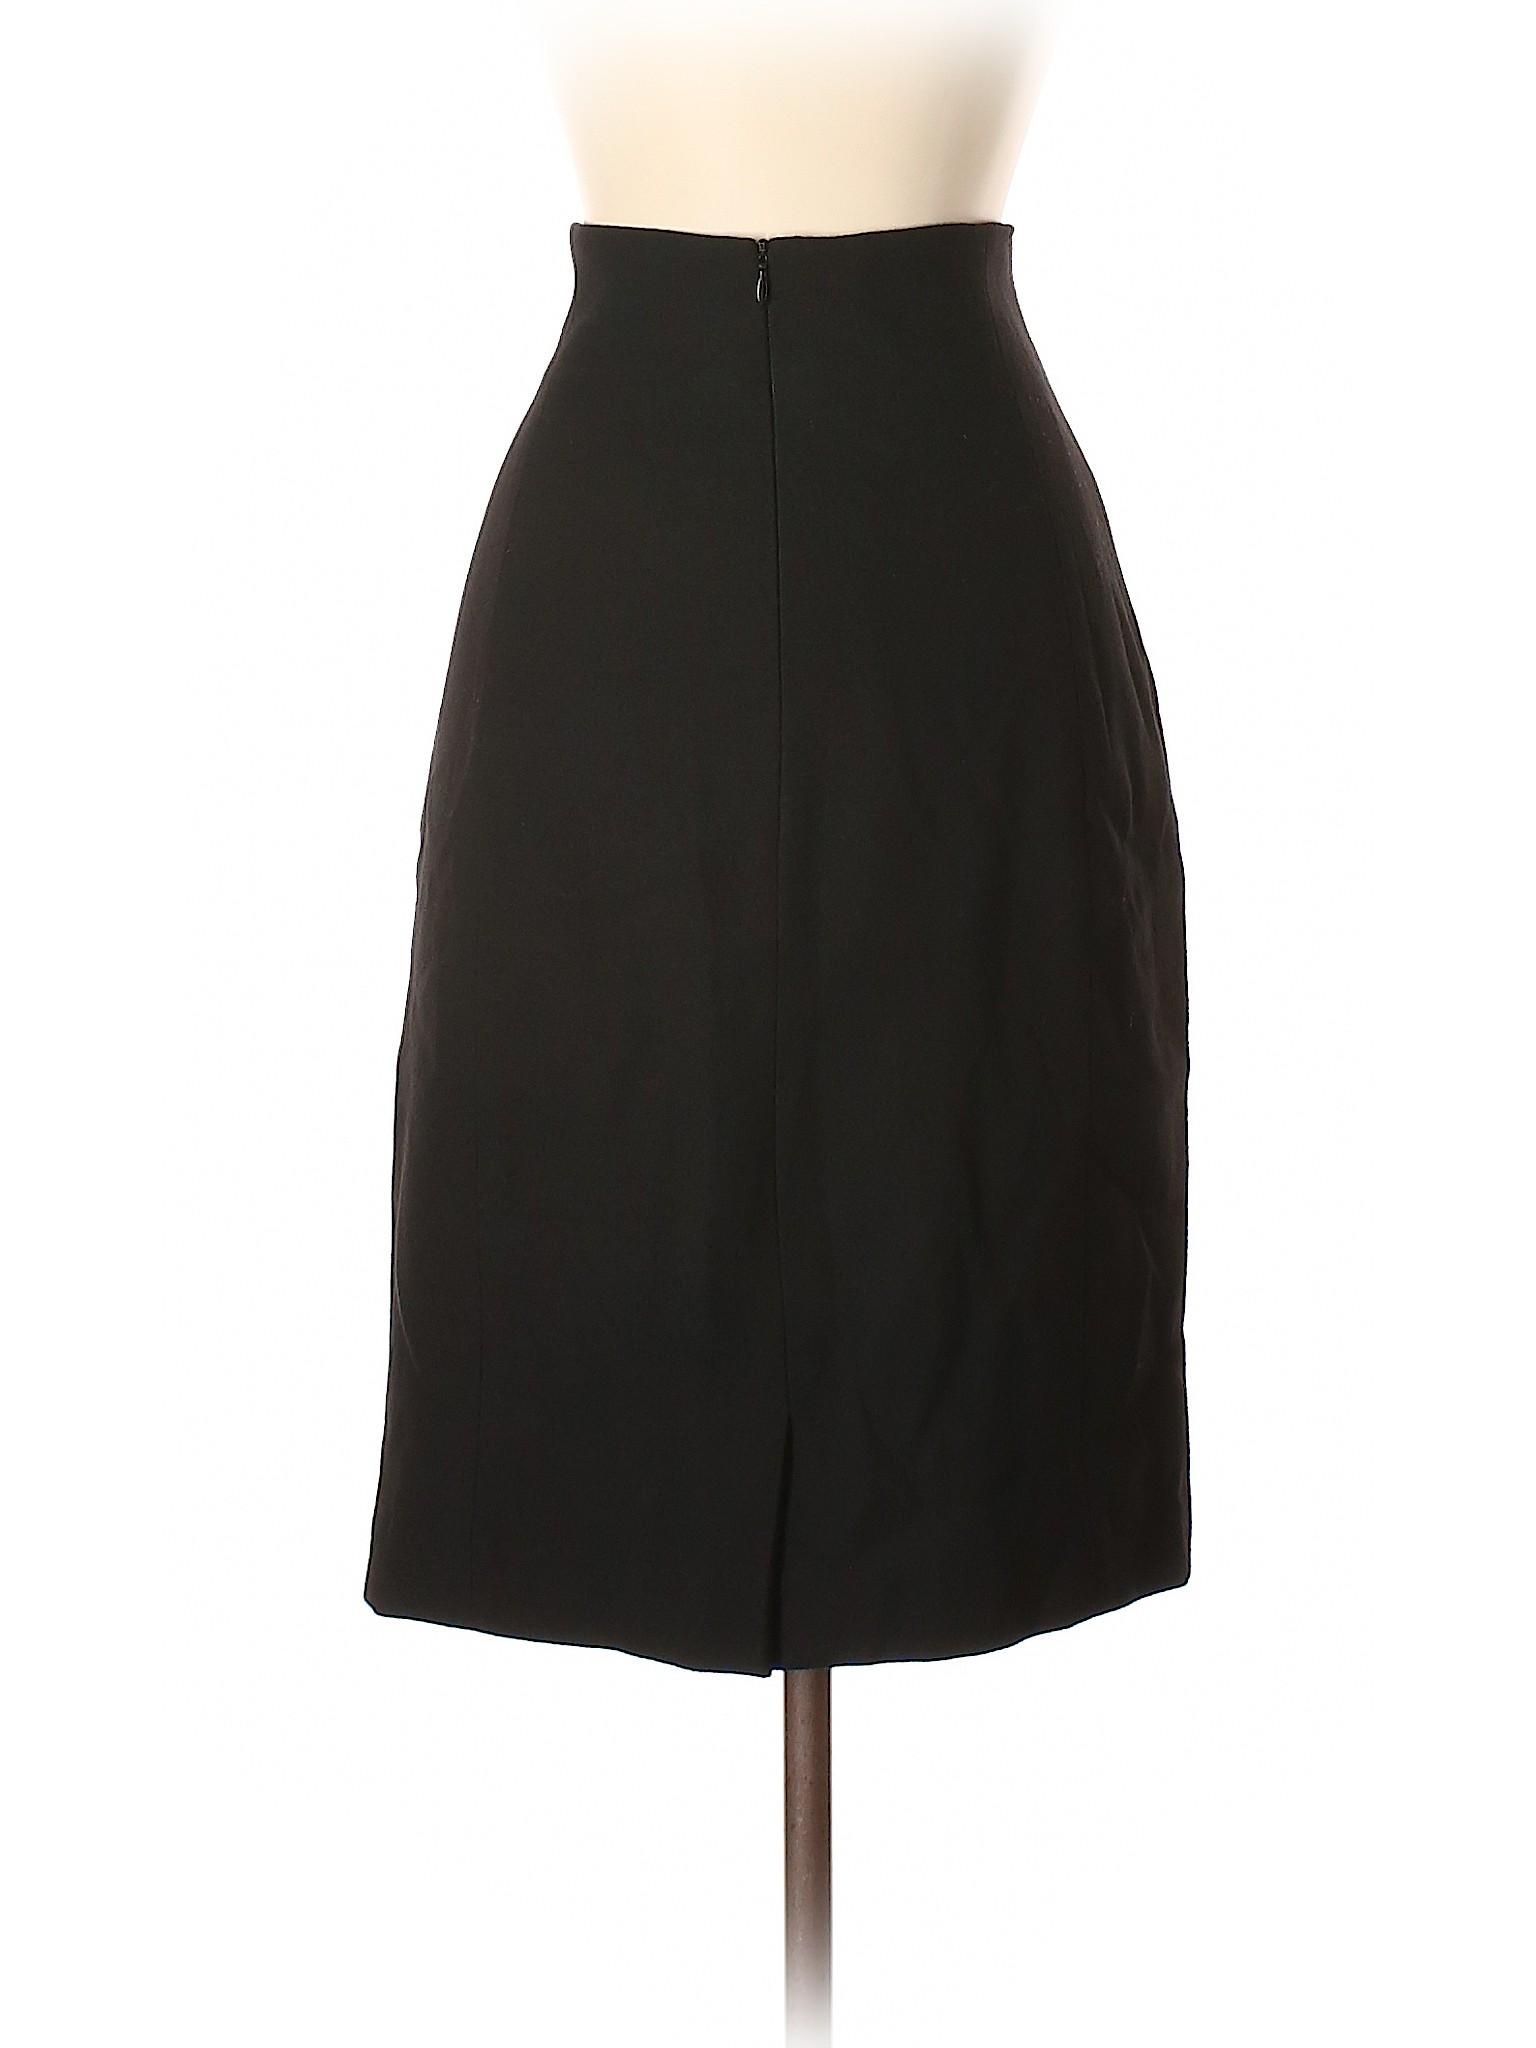 by leisure Margaretha Boutique Wool Skirt Ley Escada wOTxtxE